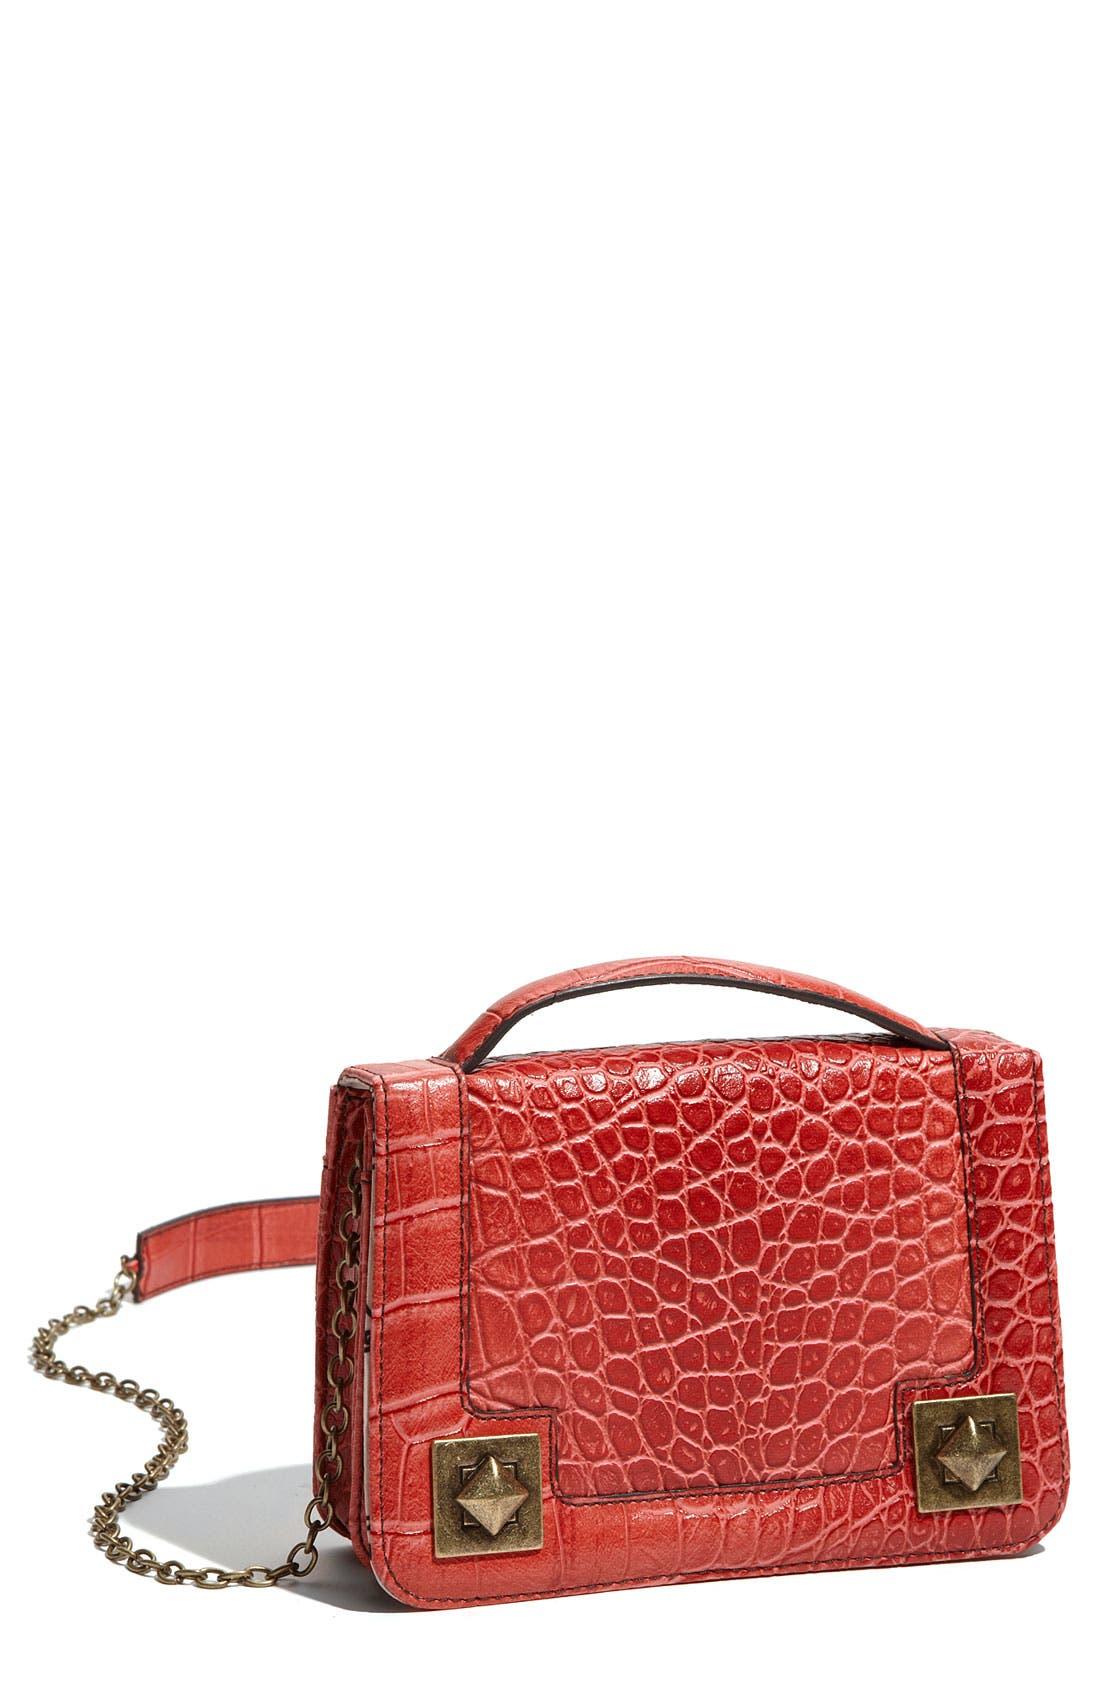 Main Image - Jessica Simpson 'Bella' Faux Leather Crossbody Bag